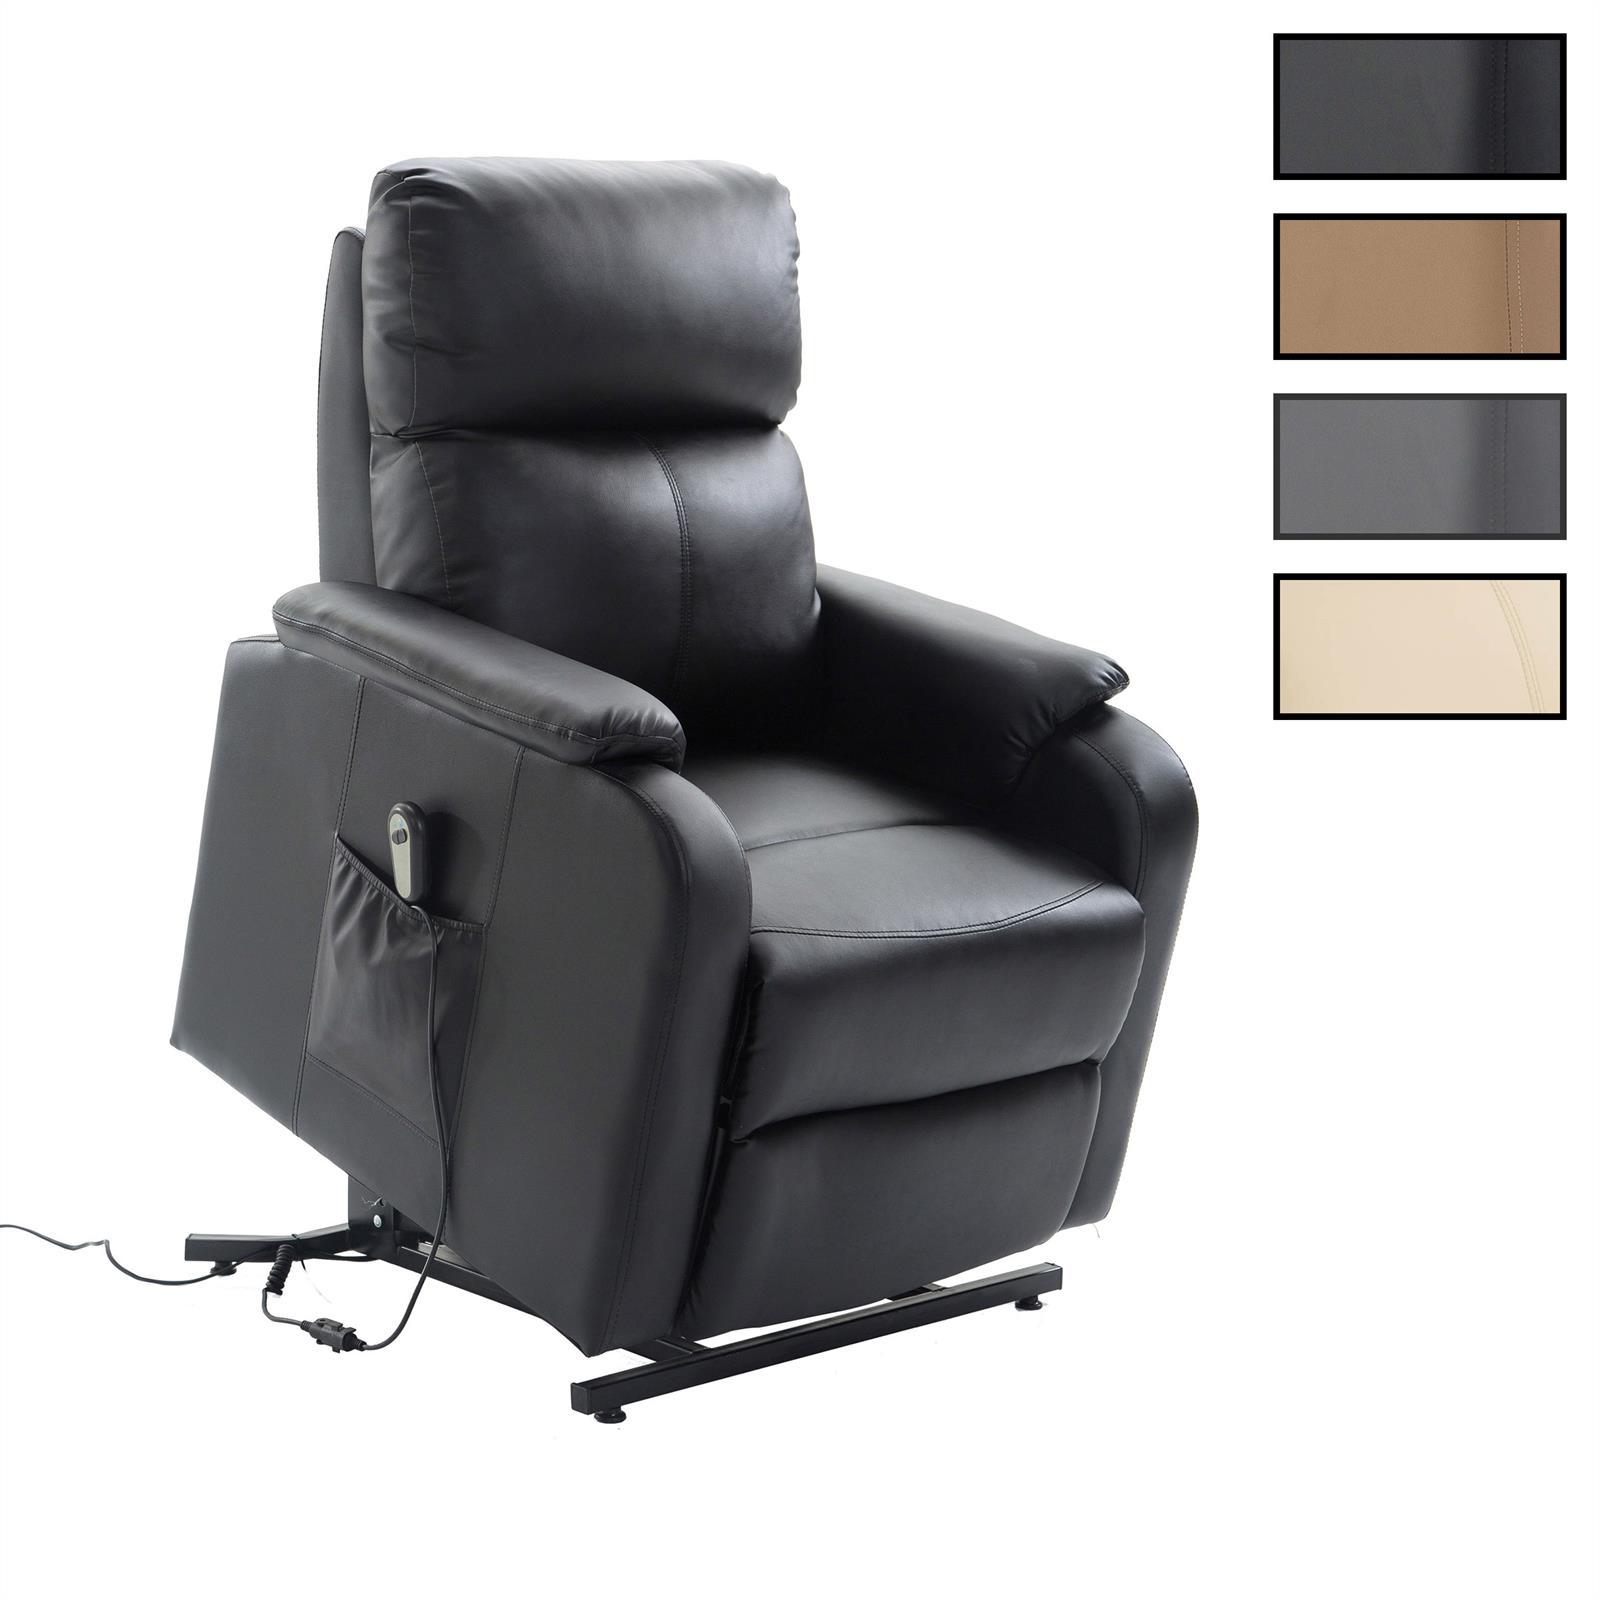 fernsehsessel senior mit aufstehfunktion caro m bel. Black Bedroom Furniture Sets. Home Design Ideas